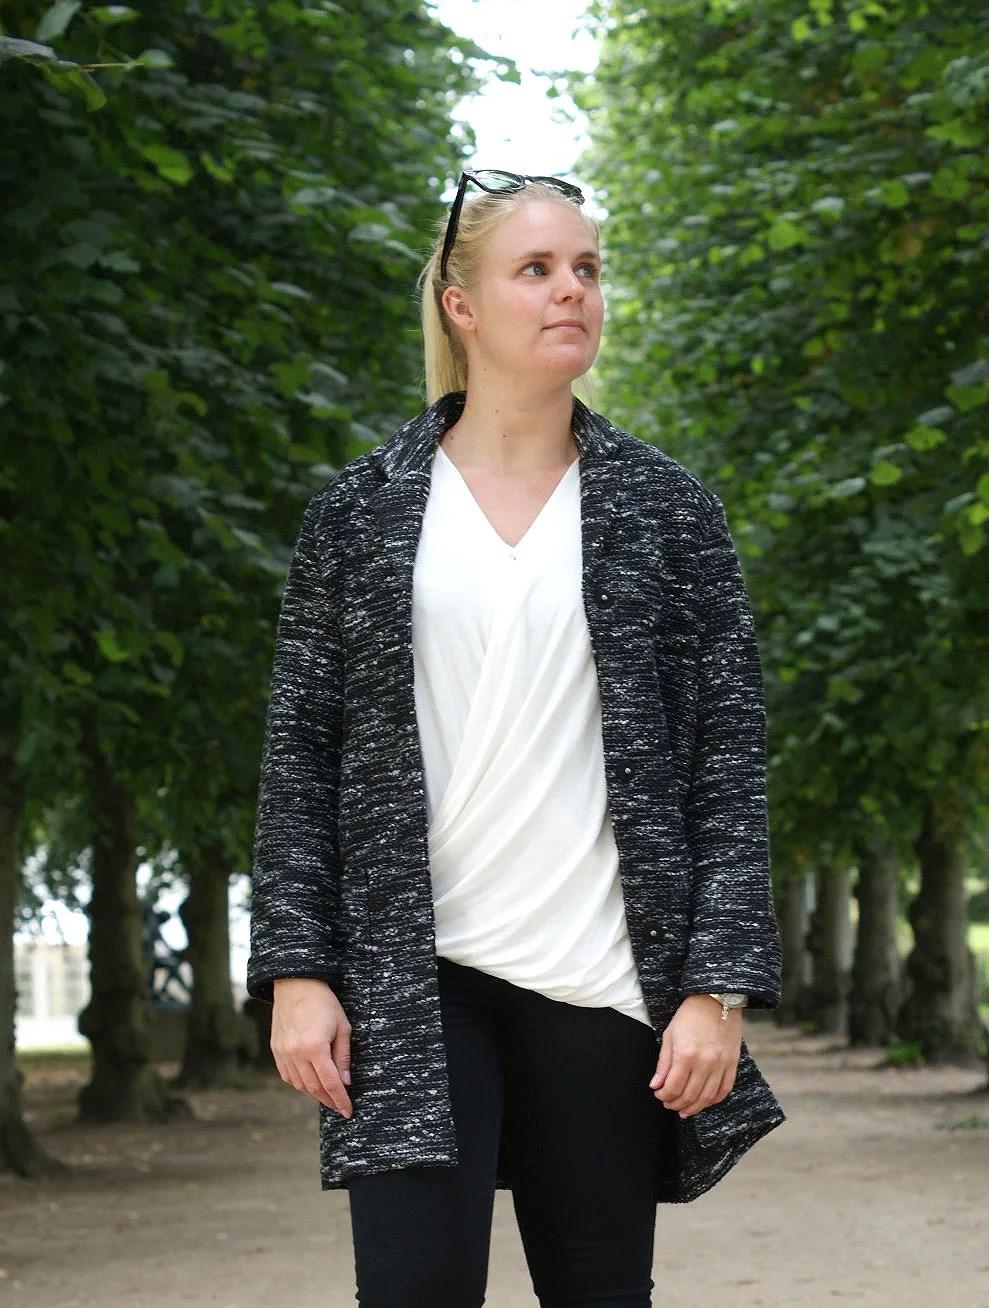 sparkzjakke-nicolettcoat-modeblogger